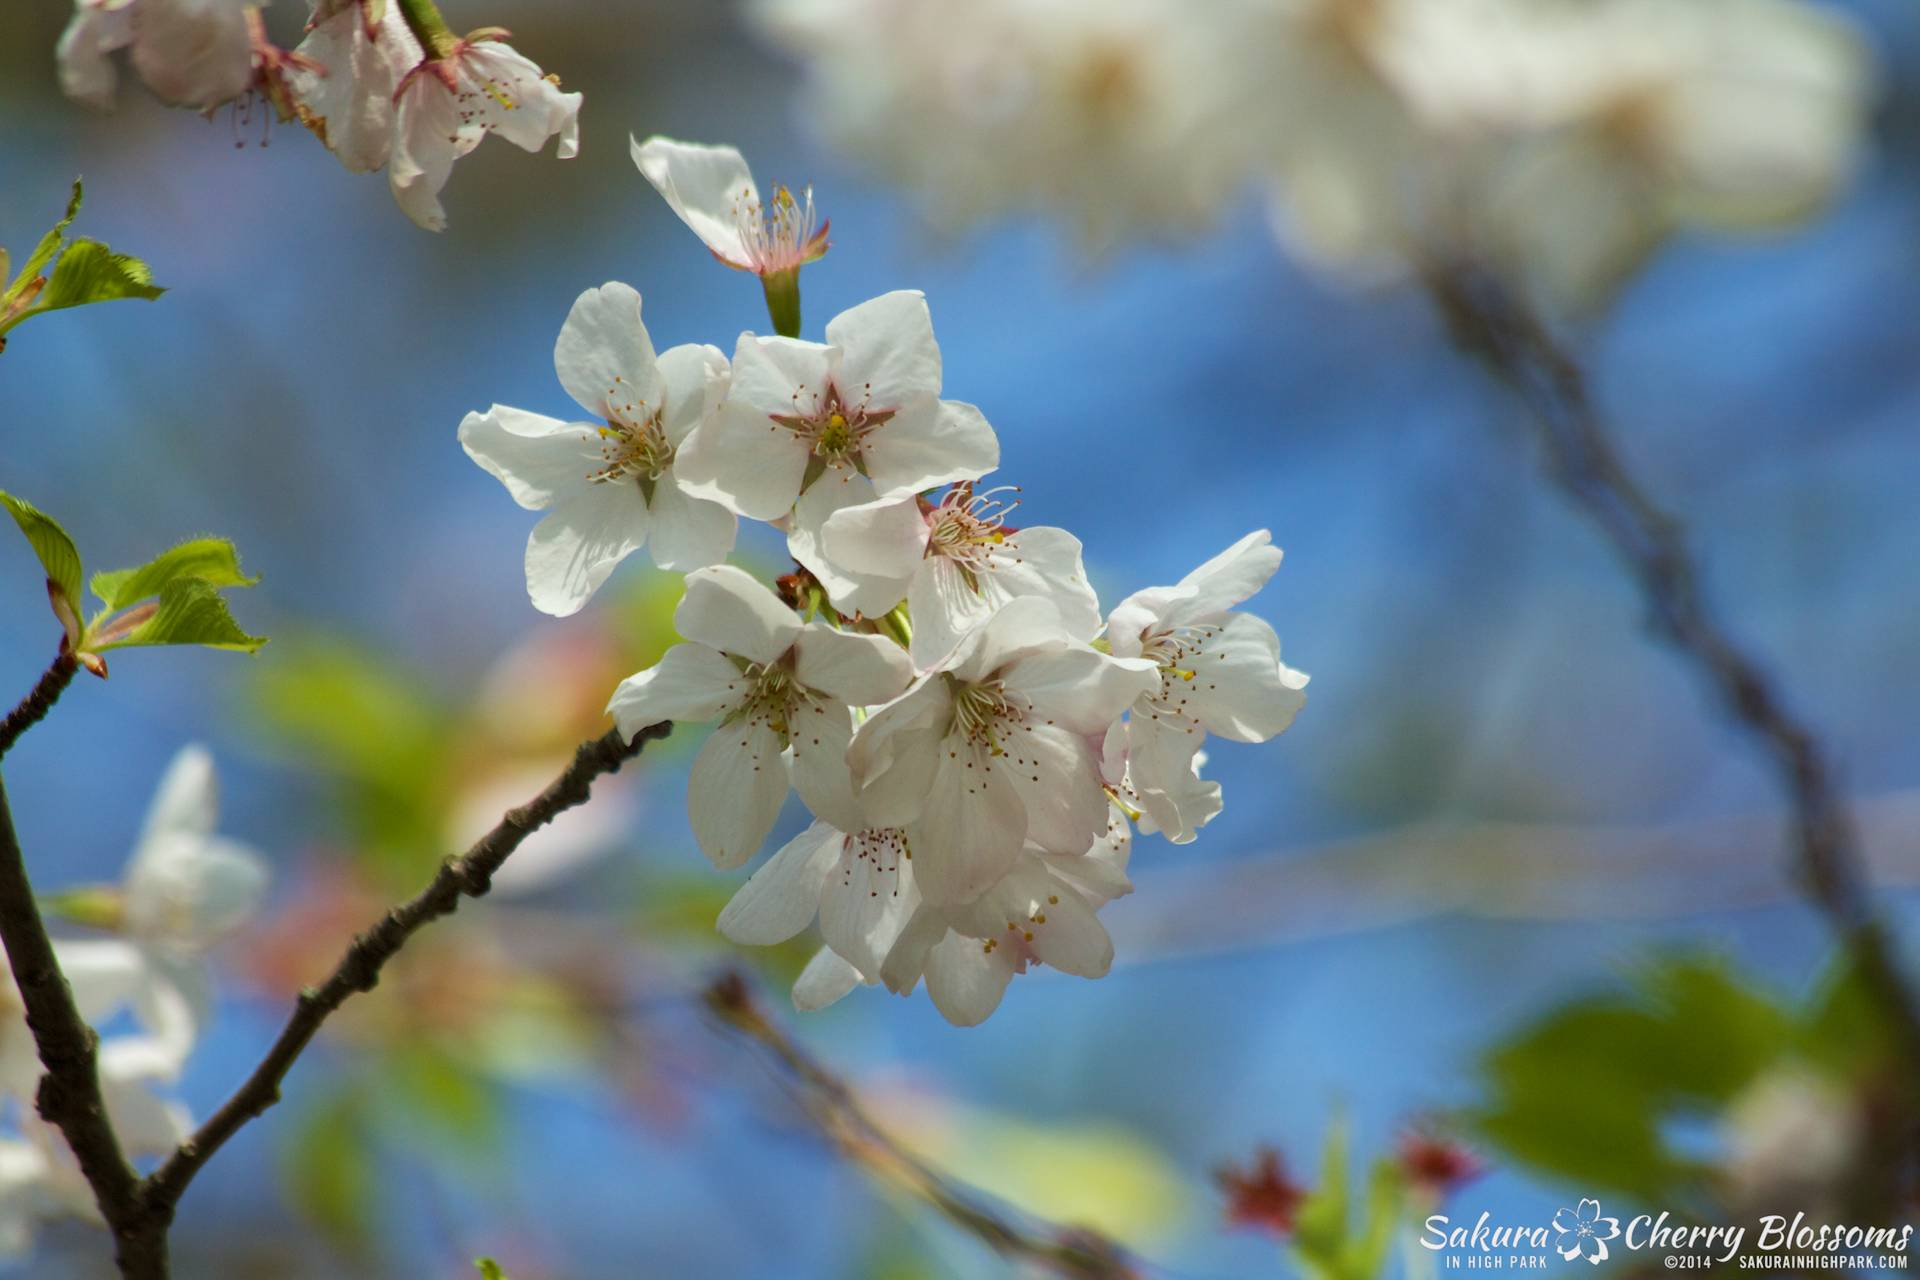 SakuraInHighPark-May2114-447.jpg